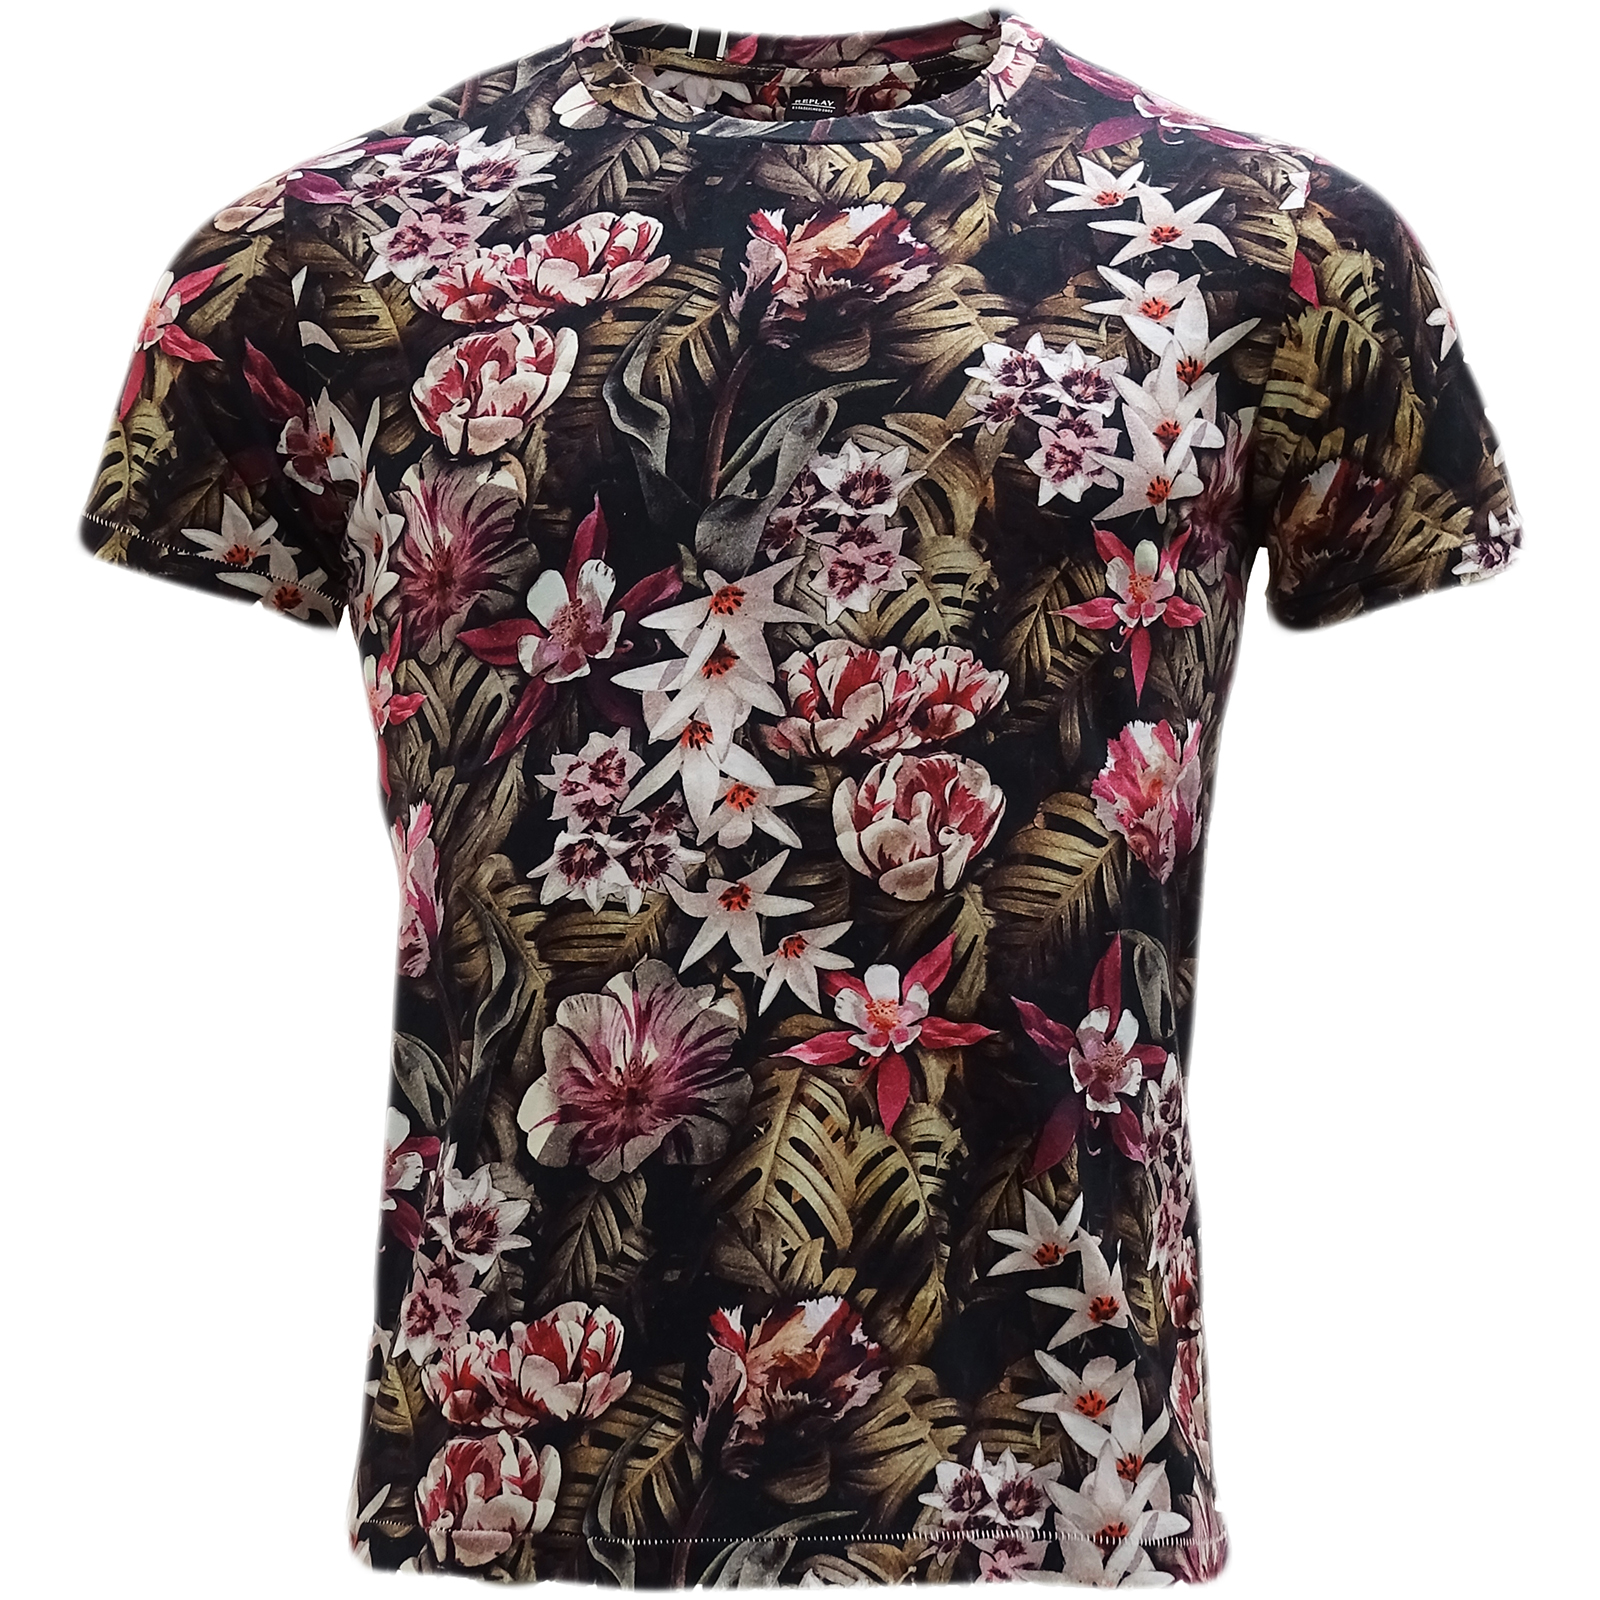 Flower Design T Shirts Flowers Healthy